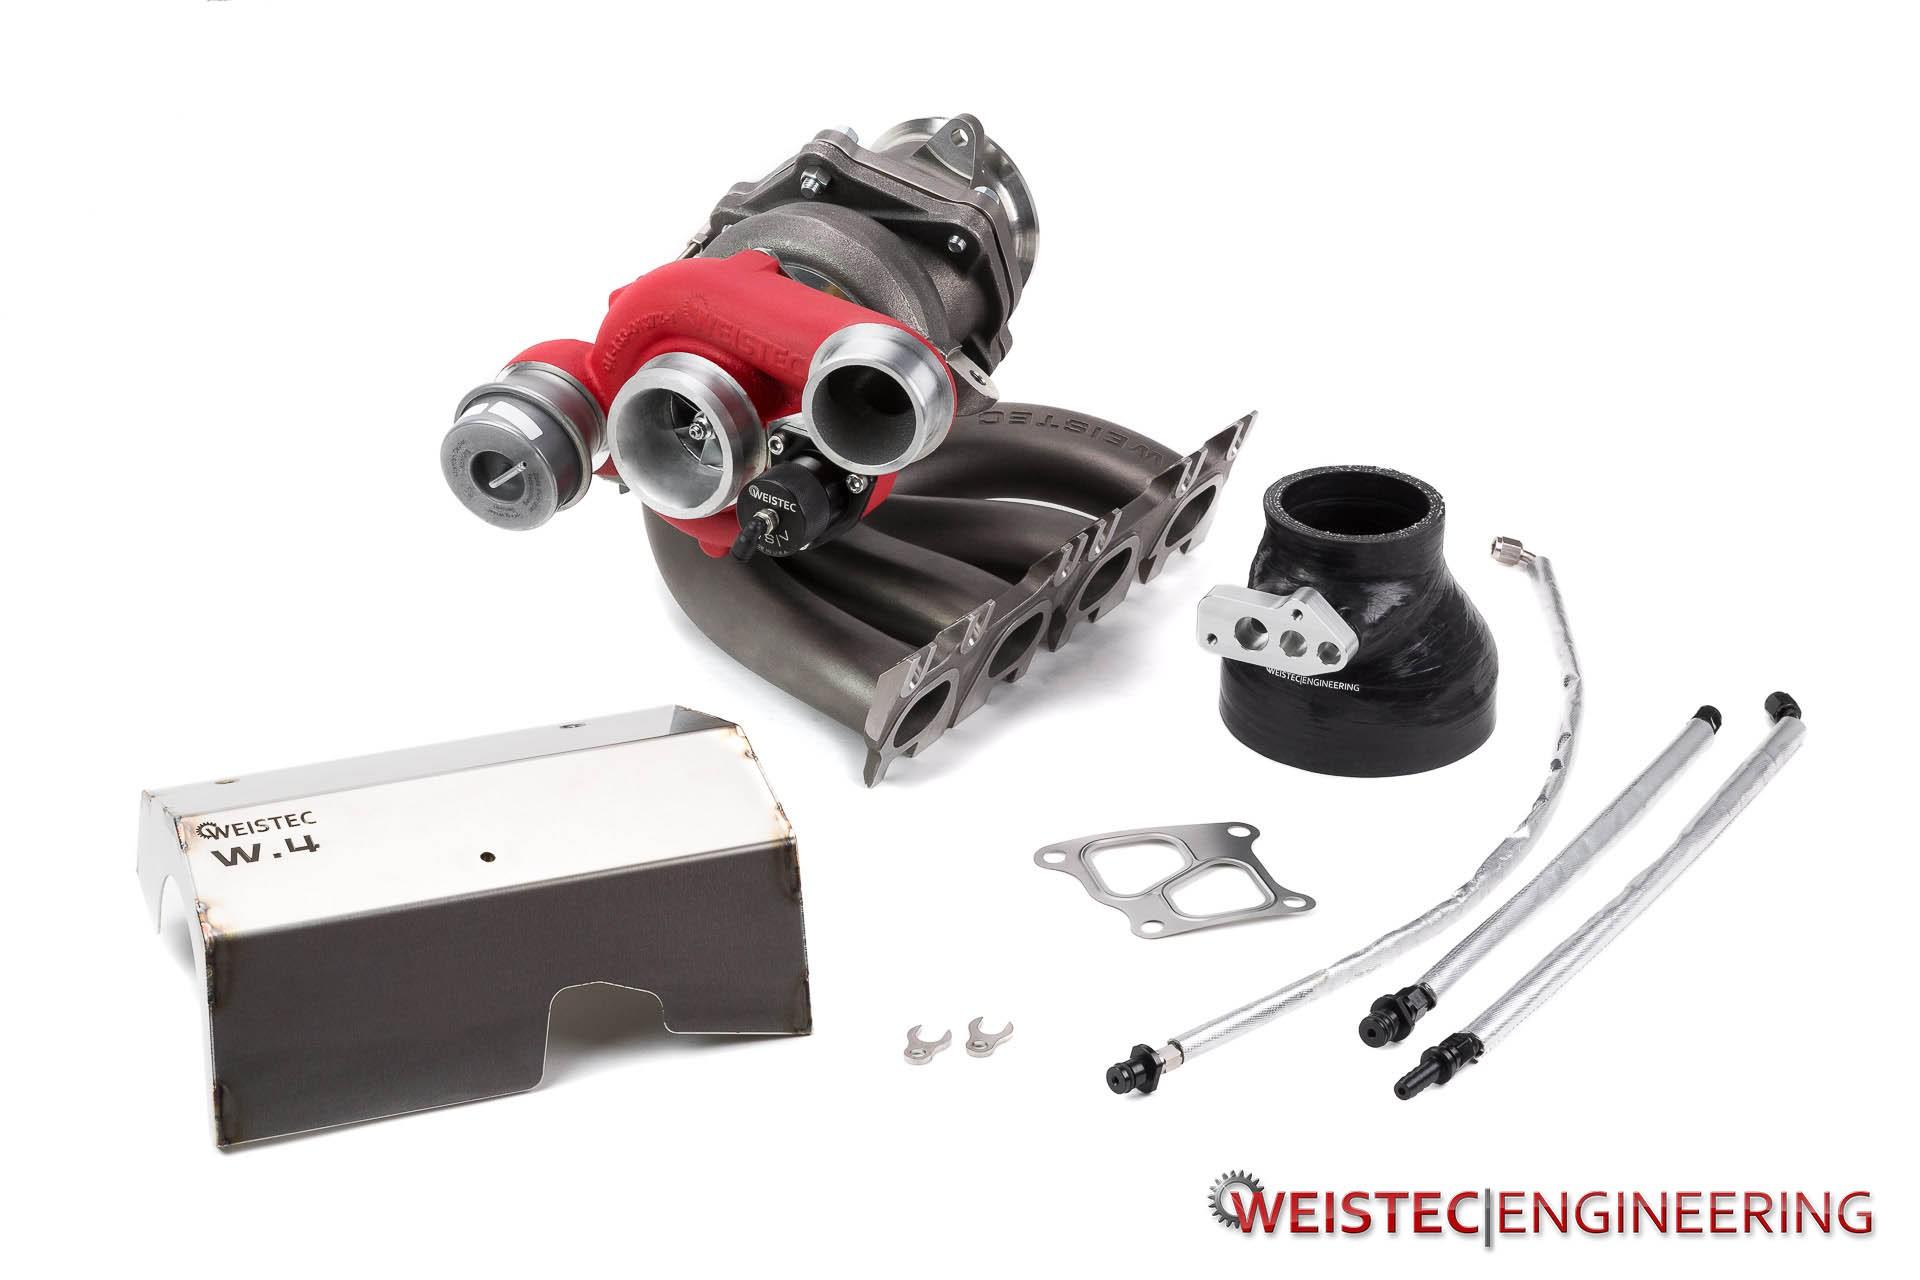 Weistec M133 W 4 GTX3071 Gen 2 Turbocharger Upgrade